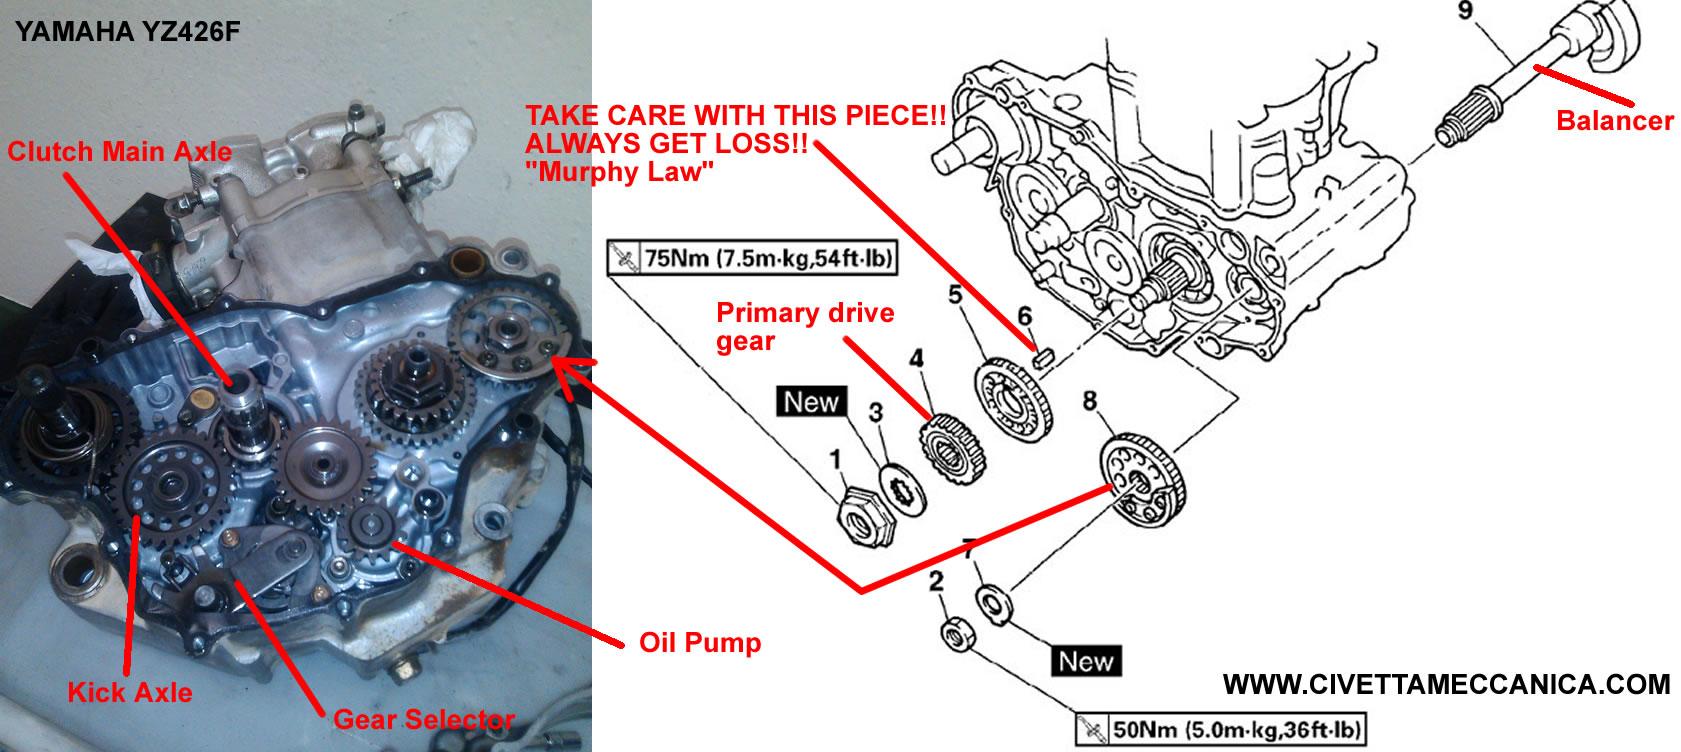 Manual YZ426F Balancer kick axle